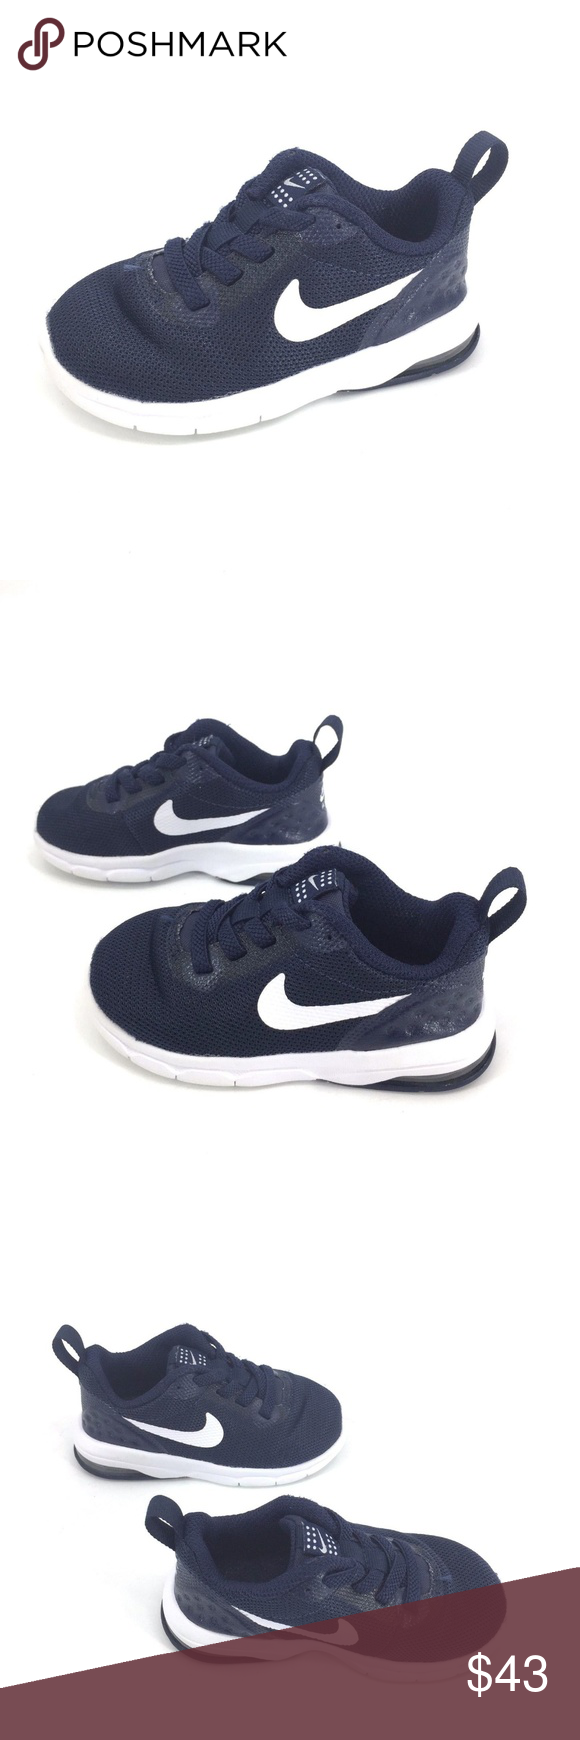 Nike Boys Infant Air Max Motion LW Sneaker Sz 6 Nike Air Max